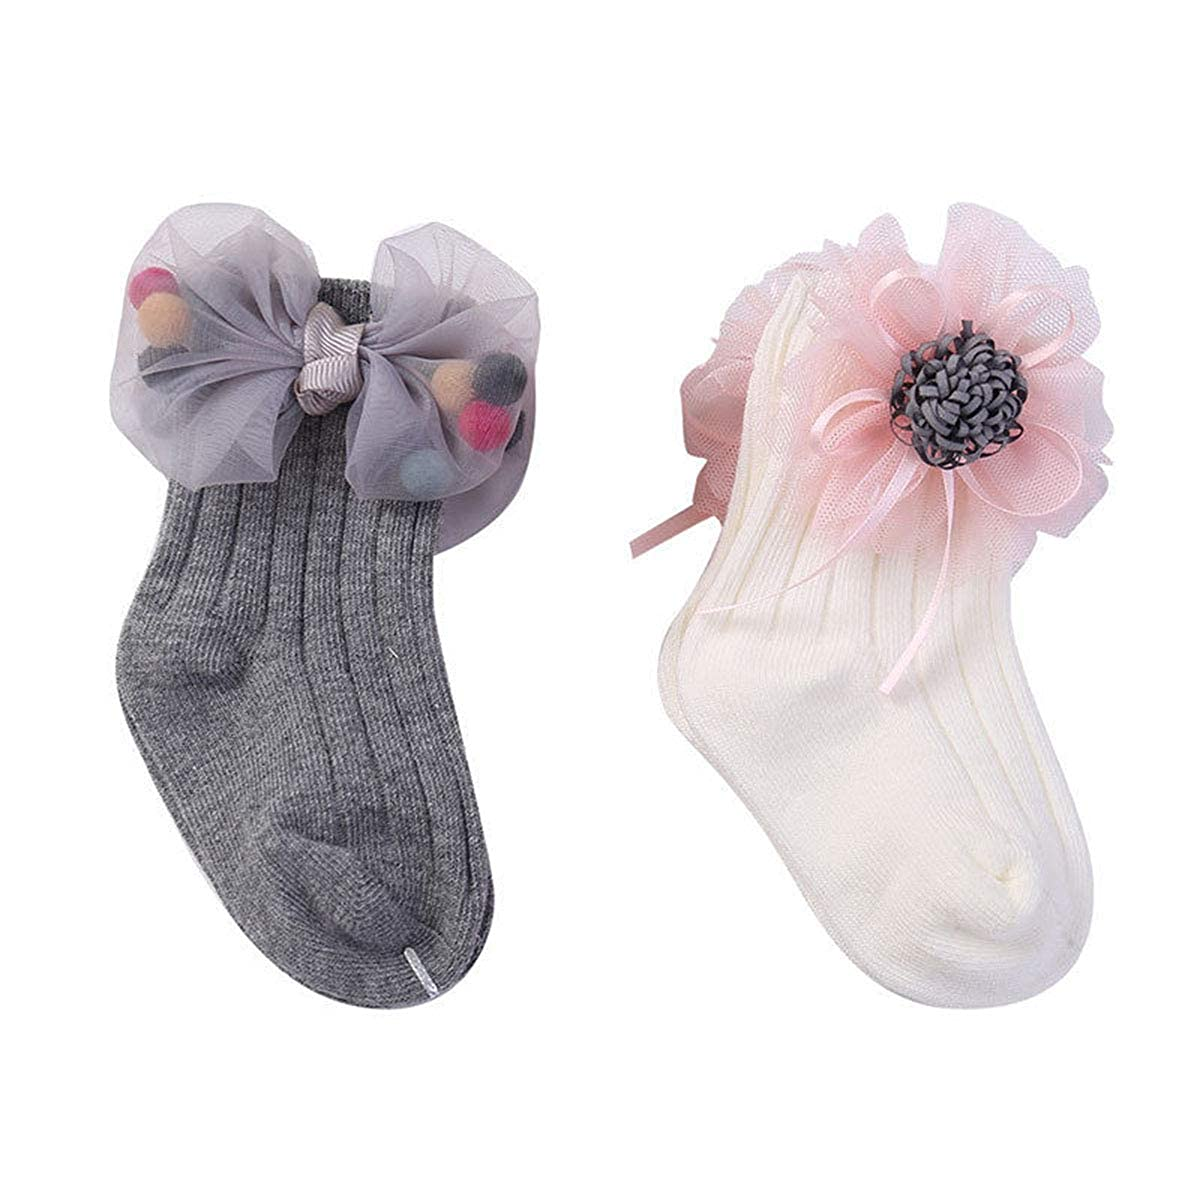 Toddler Baby Boy Girl Cartoon Socks Anti Slip Socks Animal 3D Socks Cotton Rabbit Socks